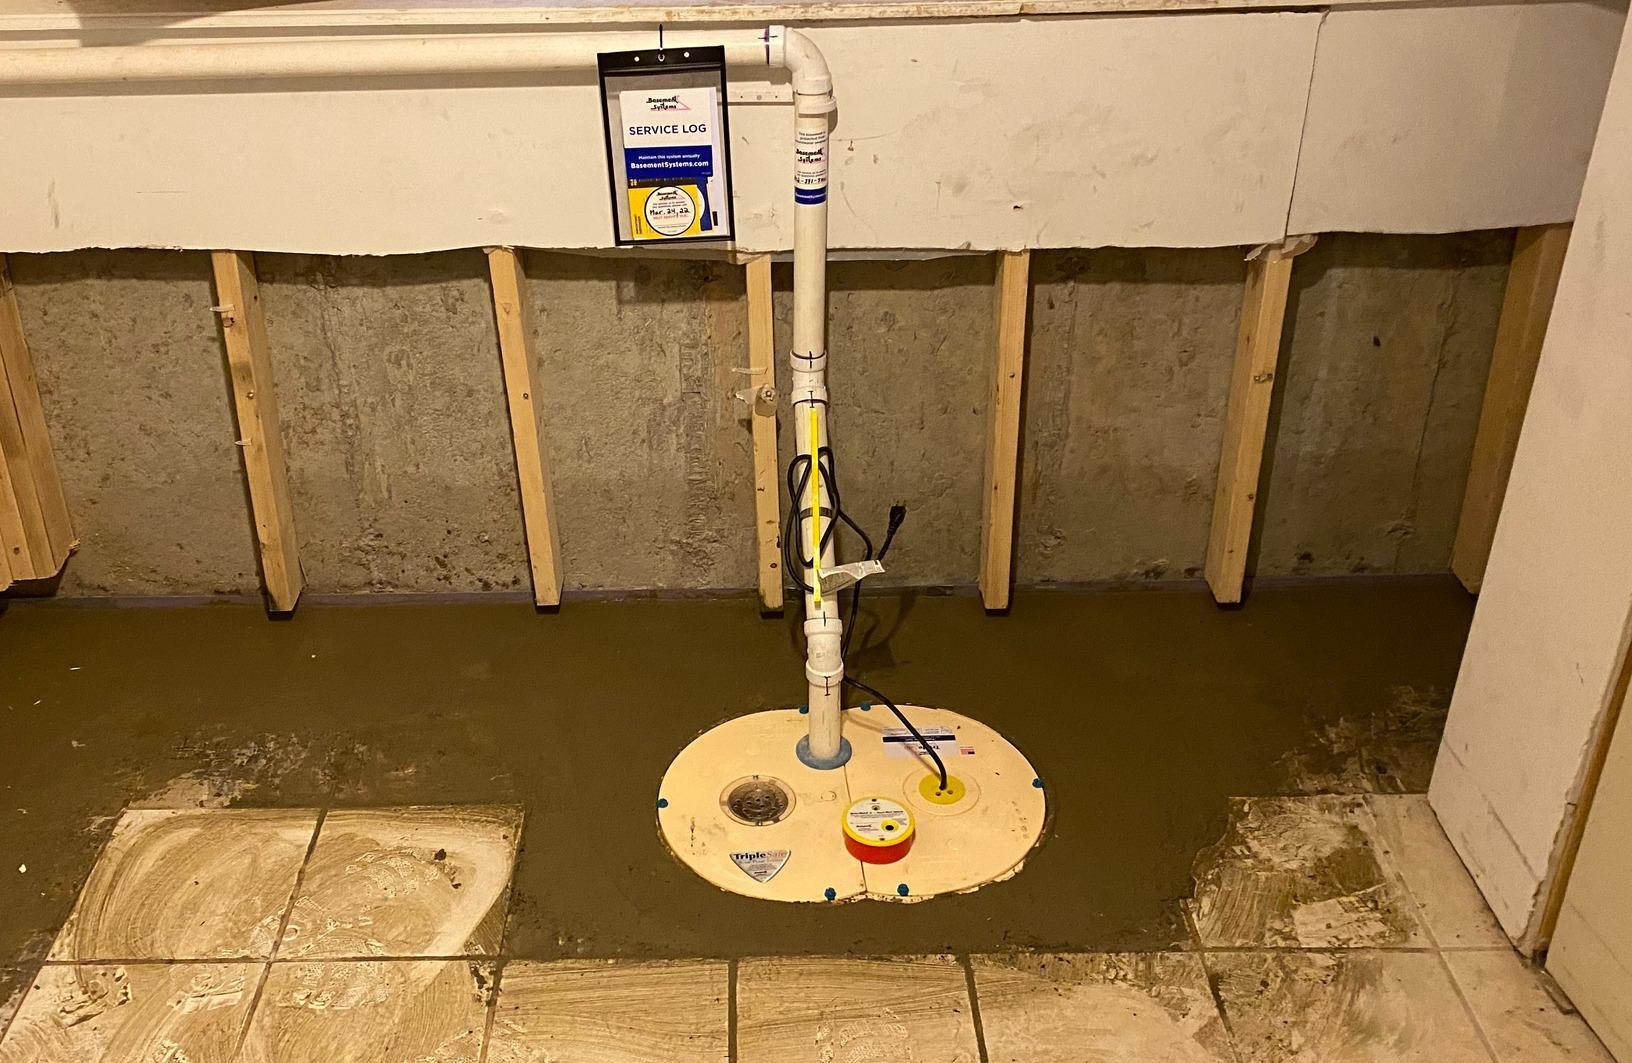 Basement Waterproofing in Shaftsbury, Vermont, by Matt Clark's Northern Basement Systems. - After Photo